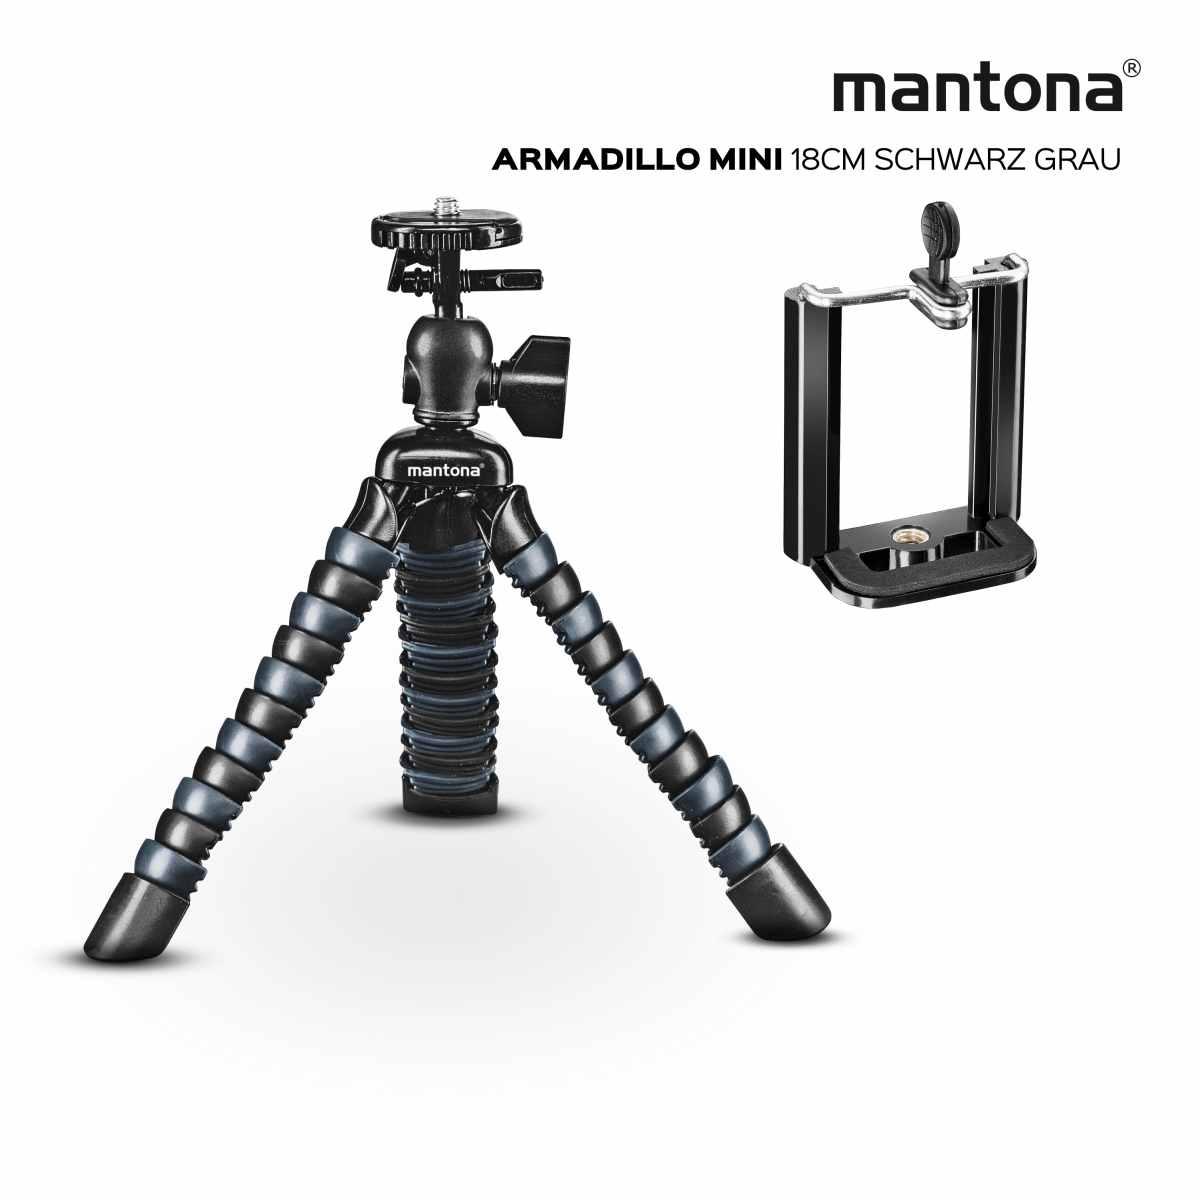 Mantona Armadillo Mini schwarz grau Mini & Tischstativ 18 cm